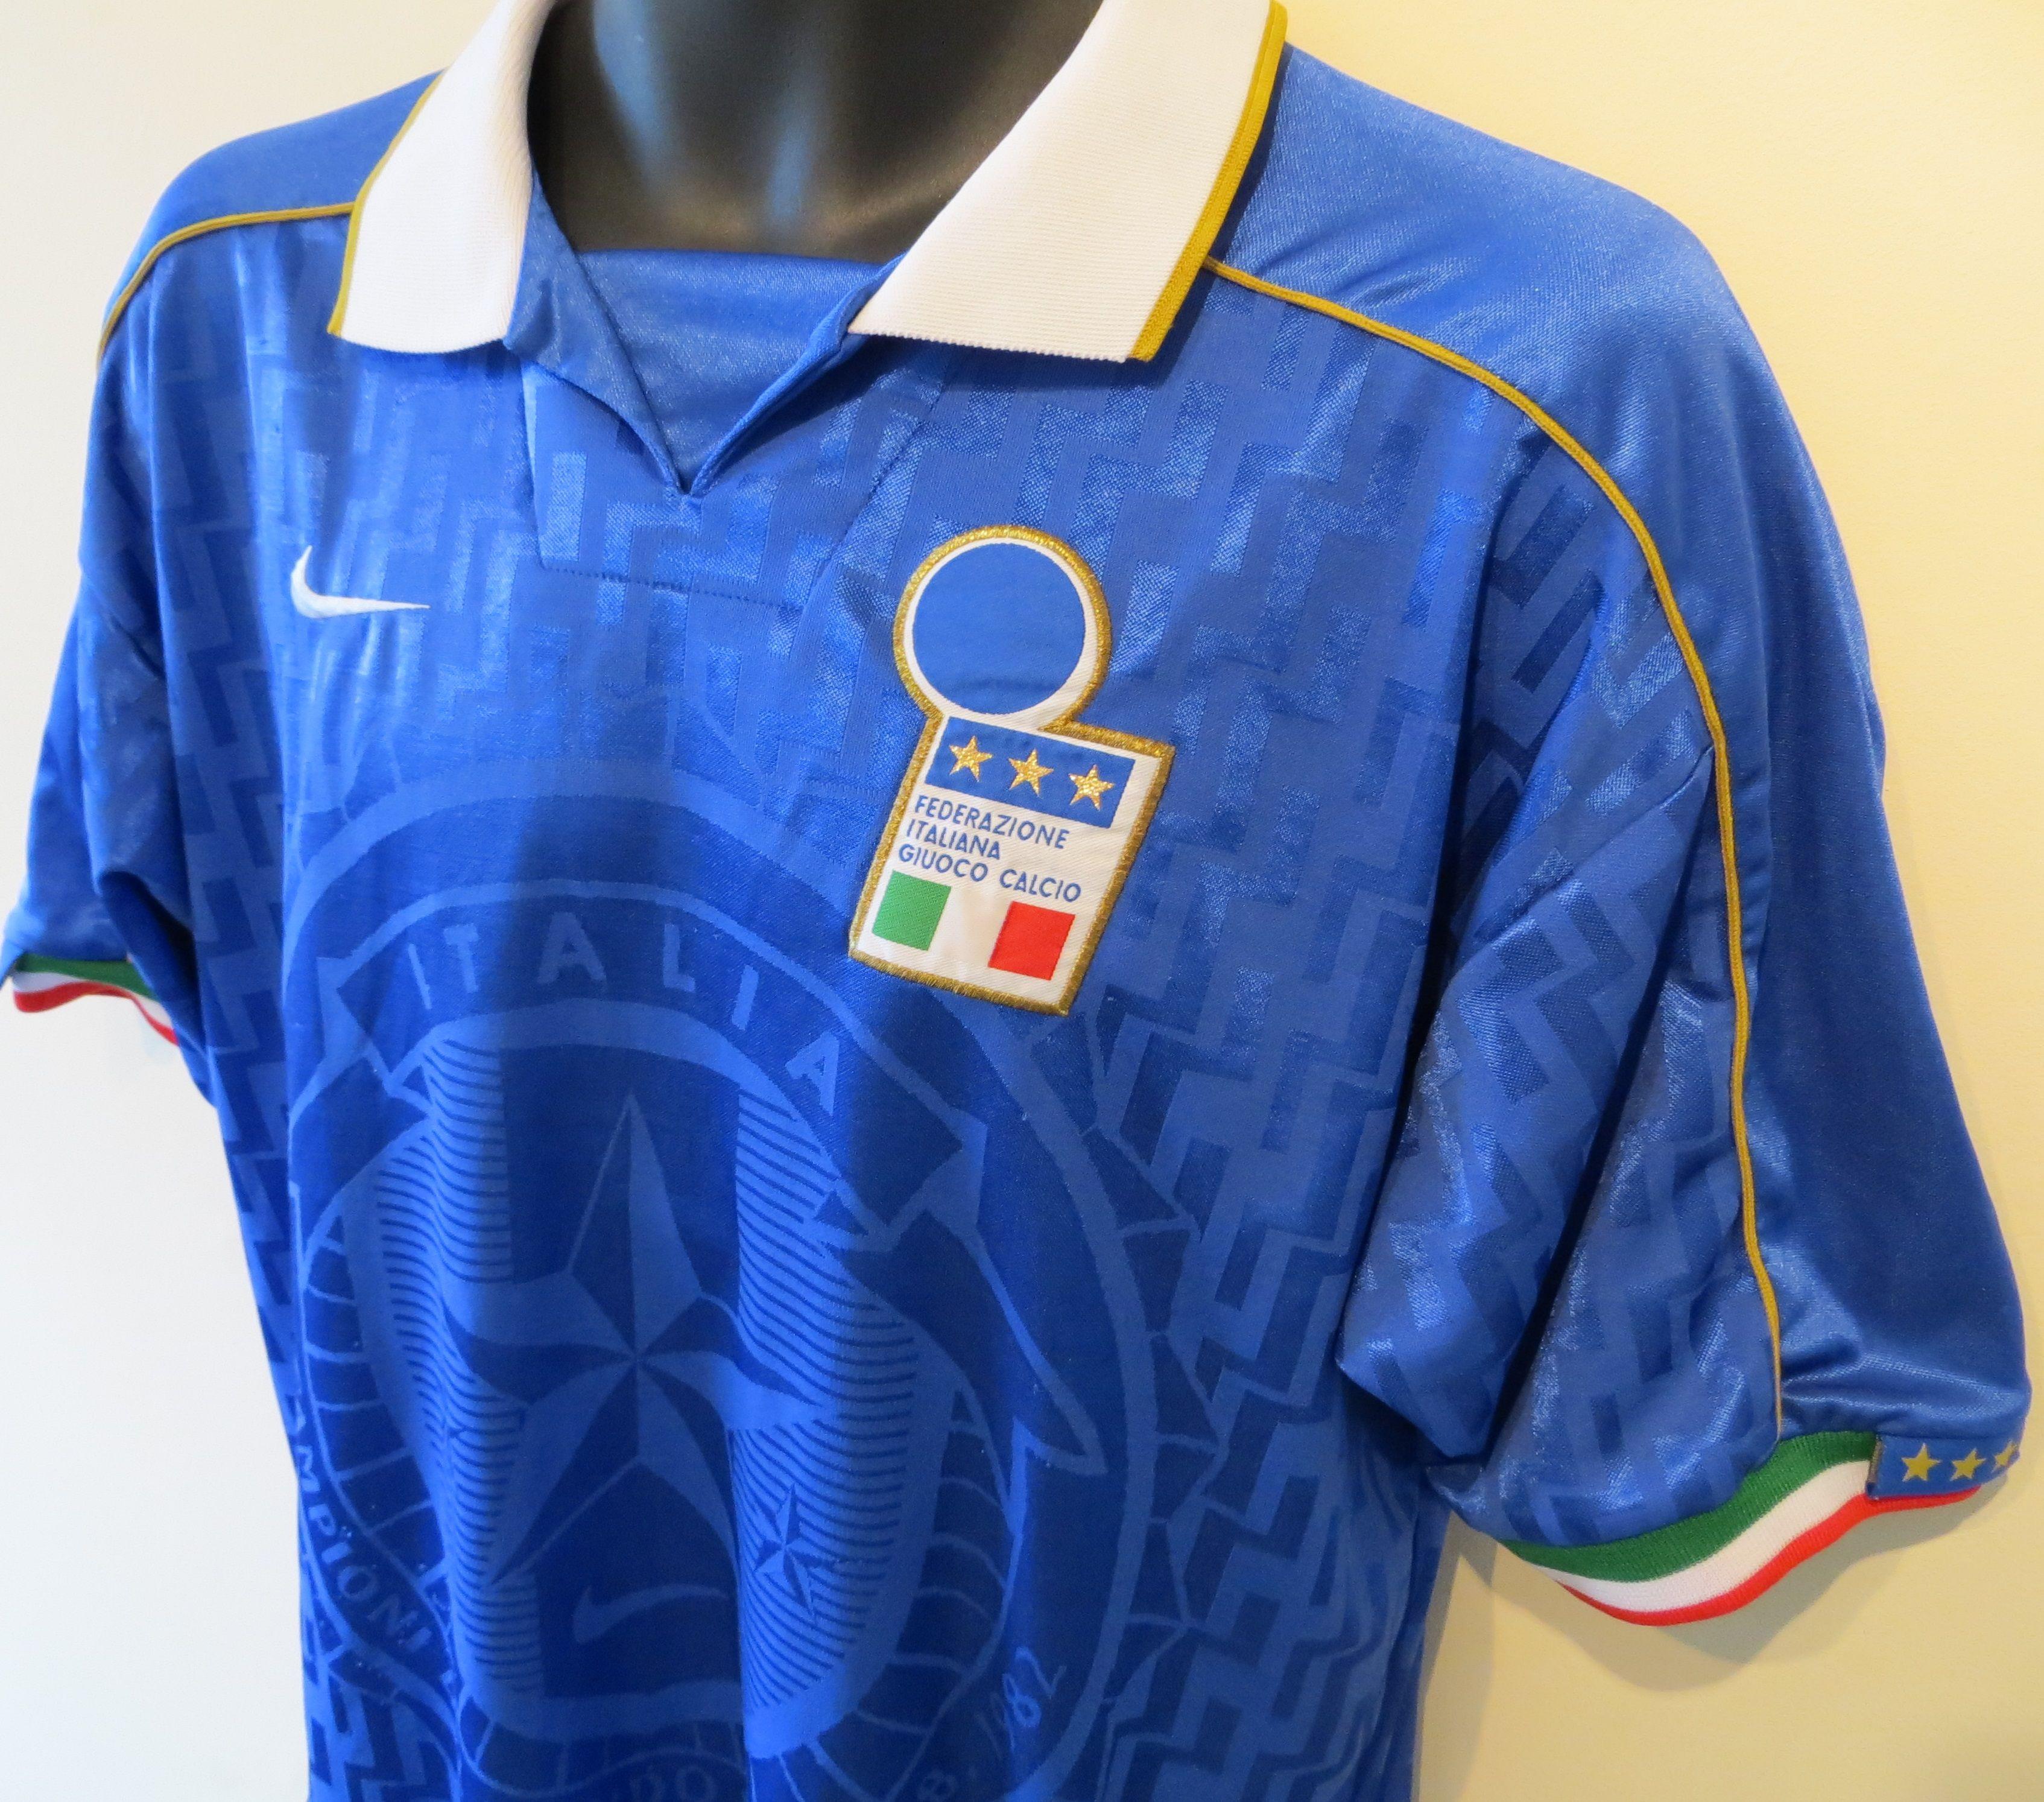 81e08220 94-96 Italy home shirt by Nike | Jersey | Retro football shirts ...